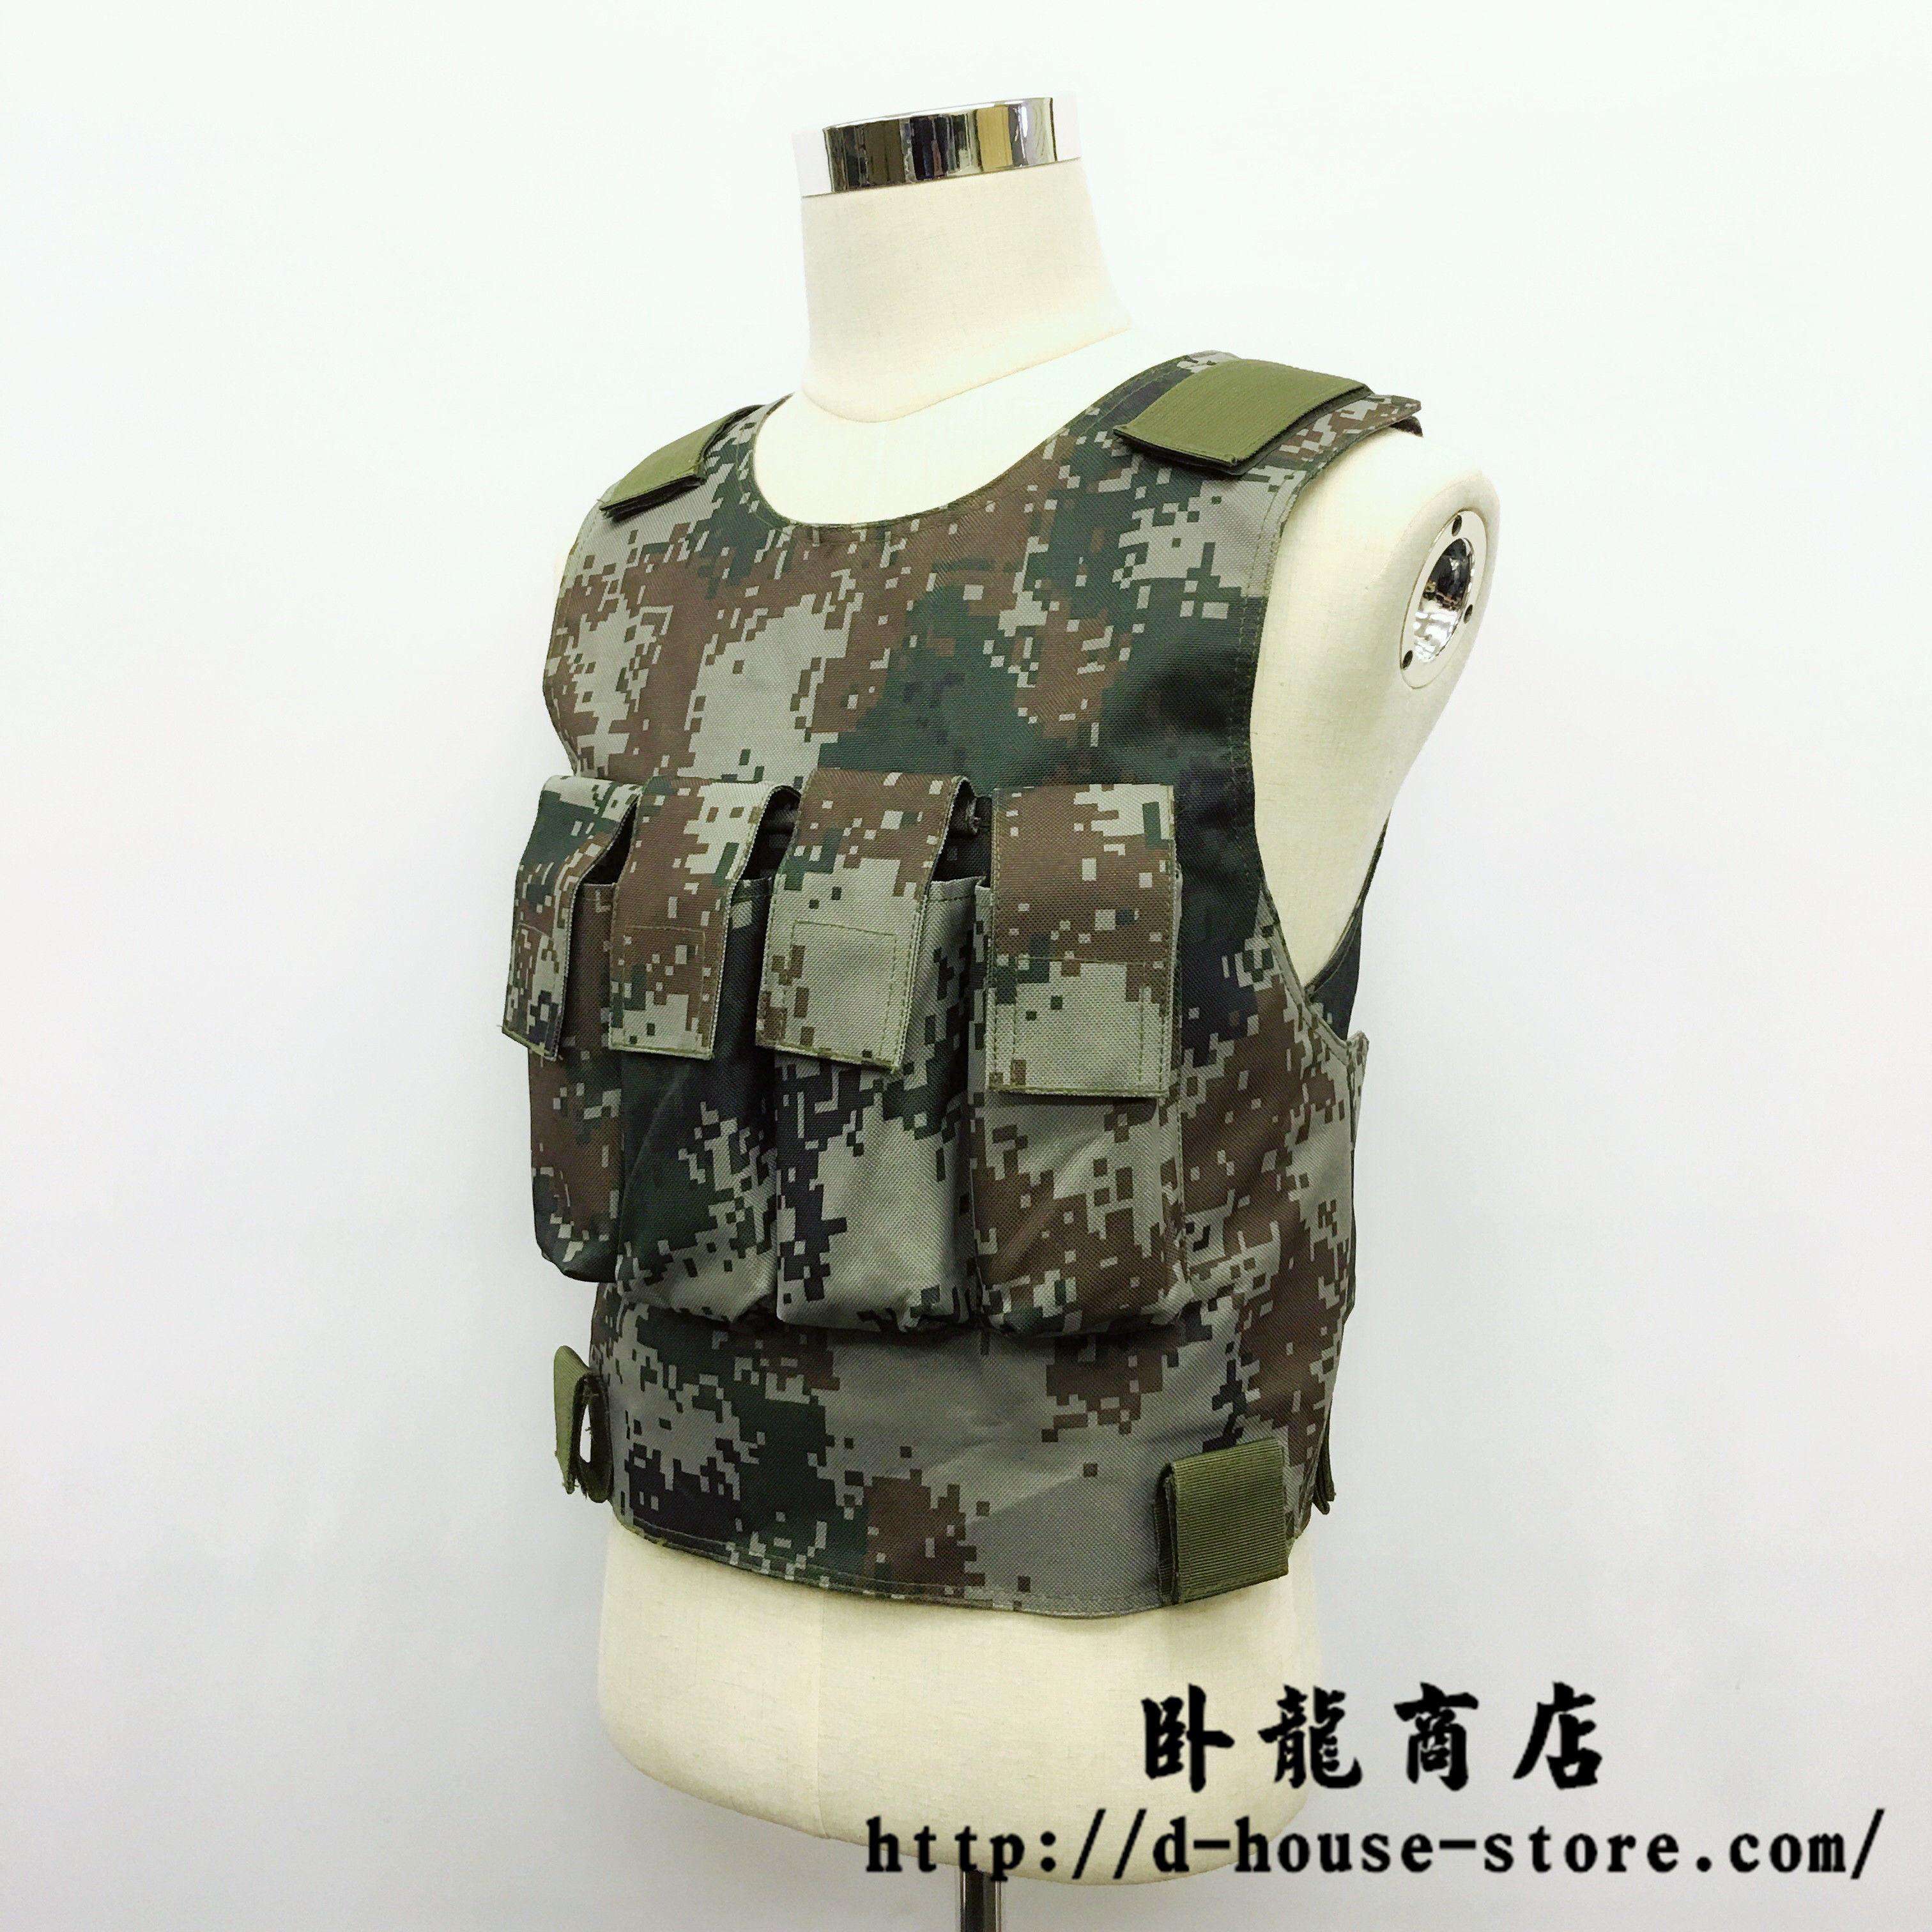 PLA 04式防弾背心 林地迷彩